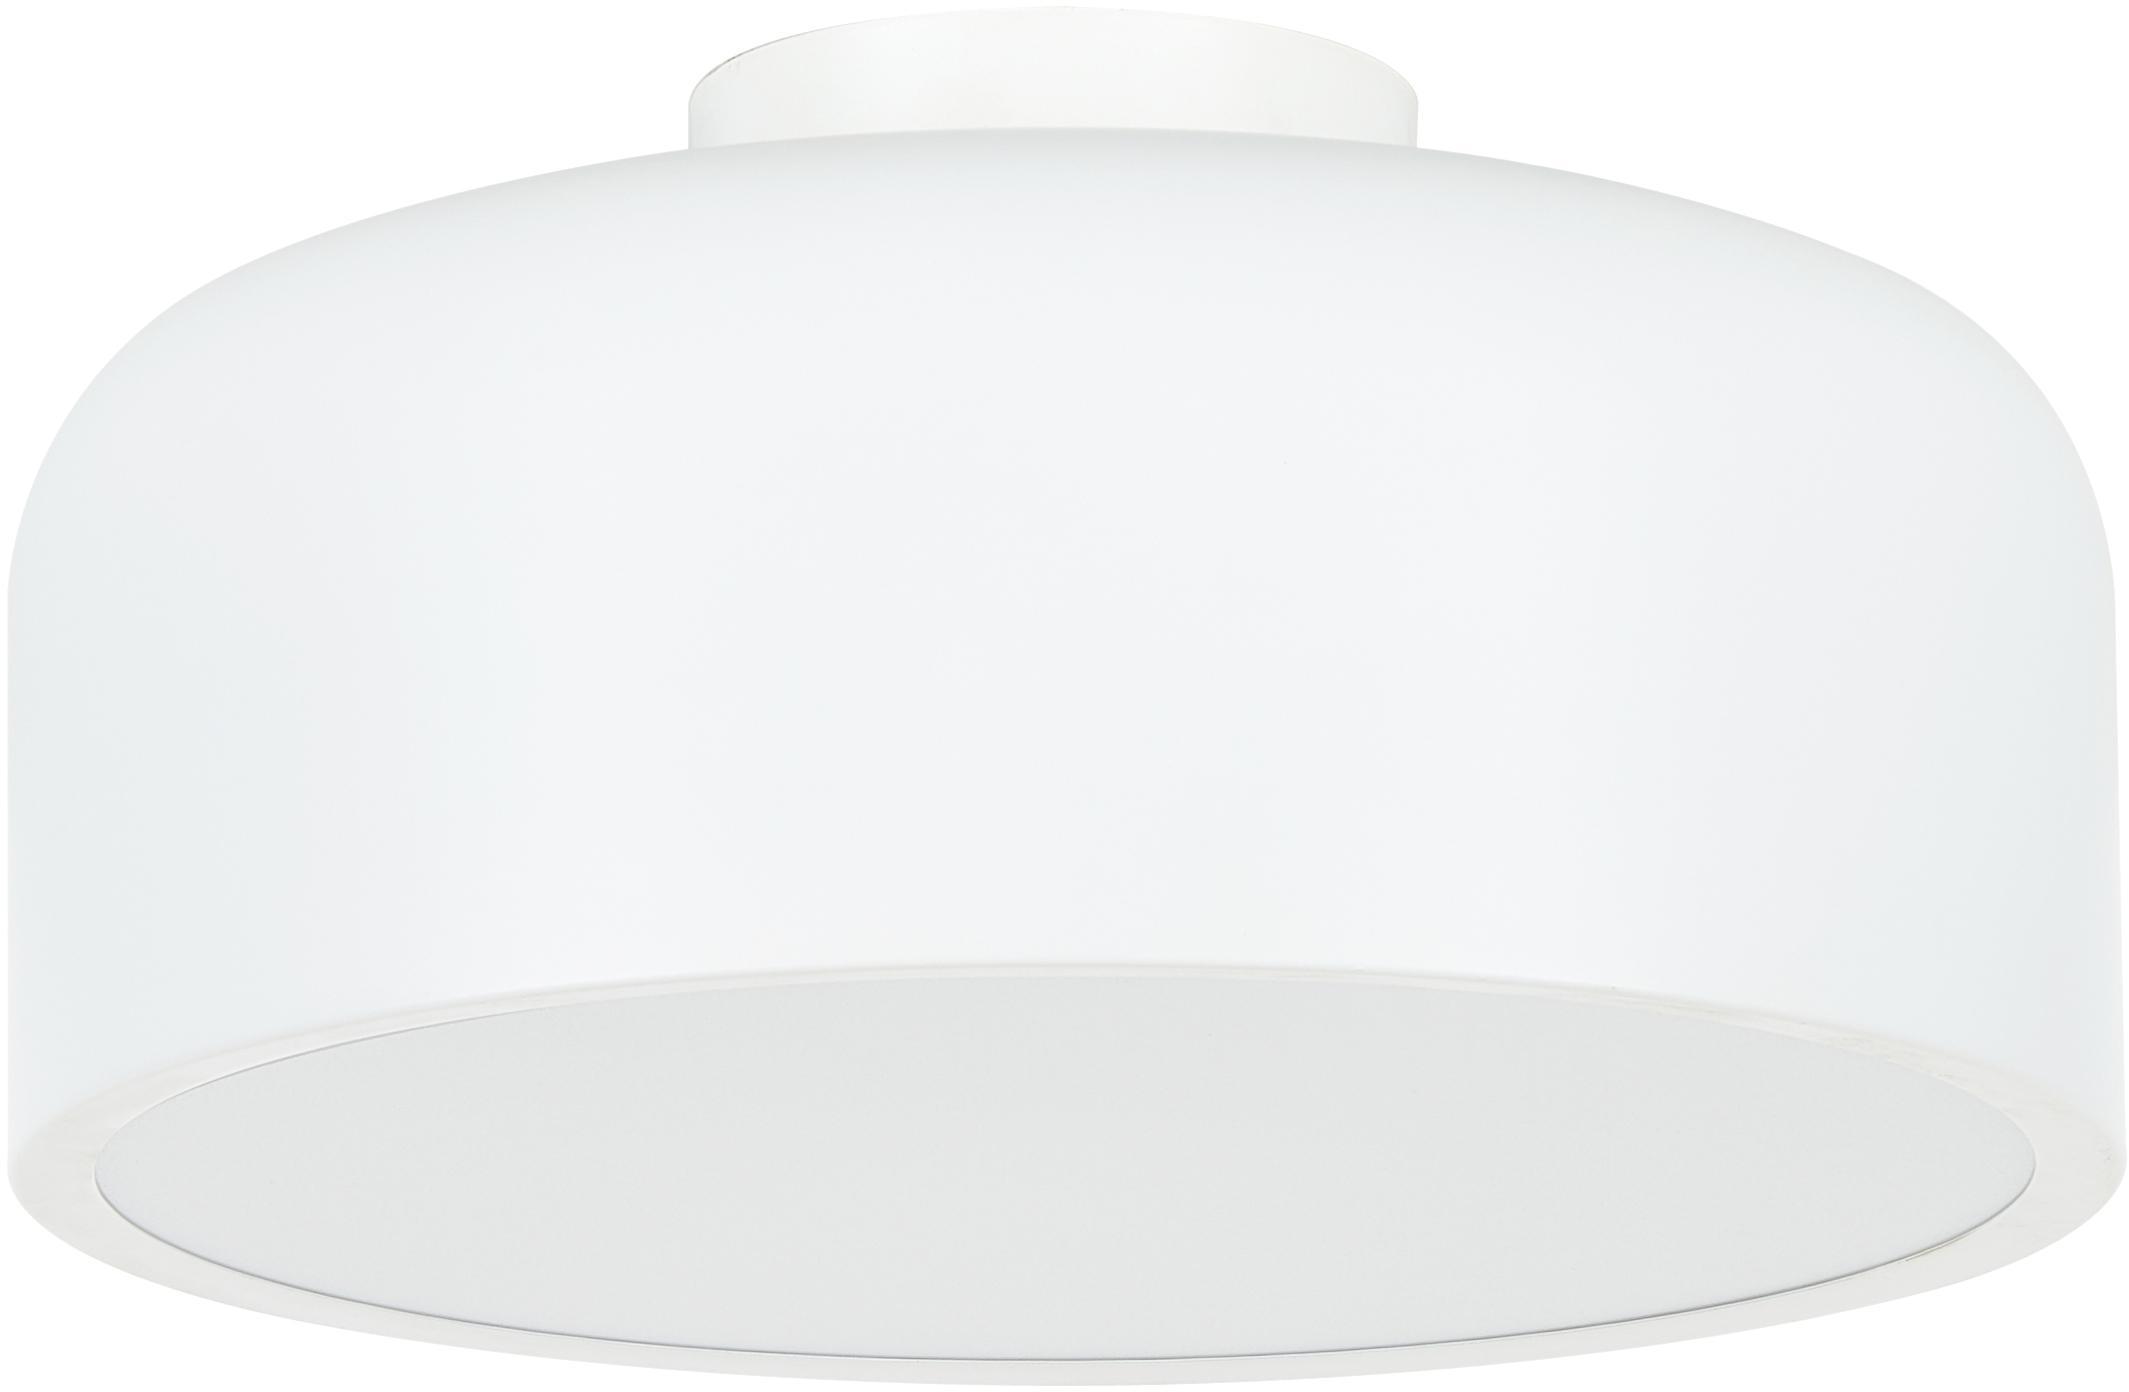 Plafondlamp Ole, Diffuser: acryl, Mat wit, Ø 35 x H 18 cm